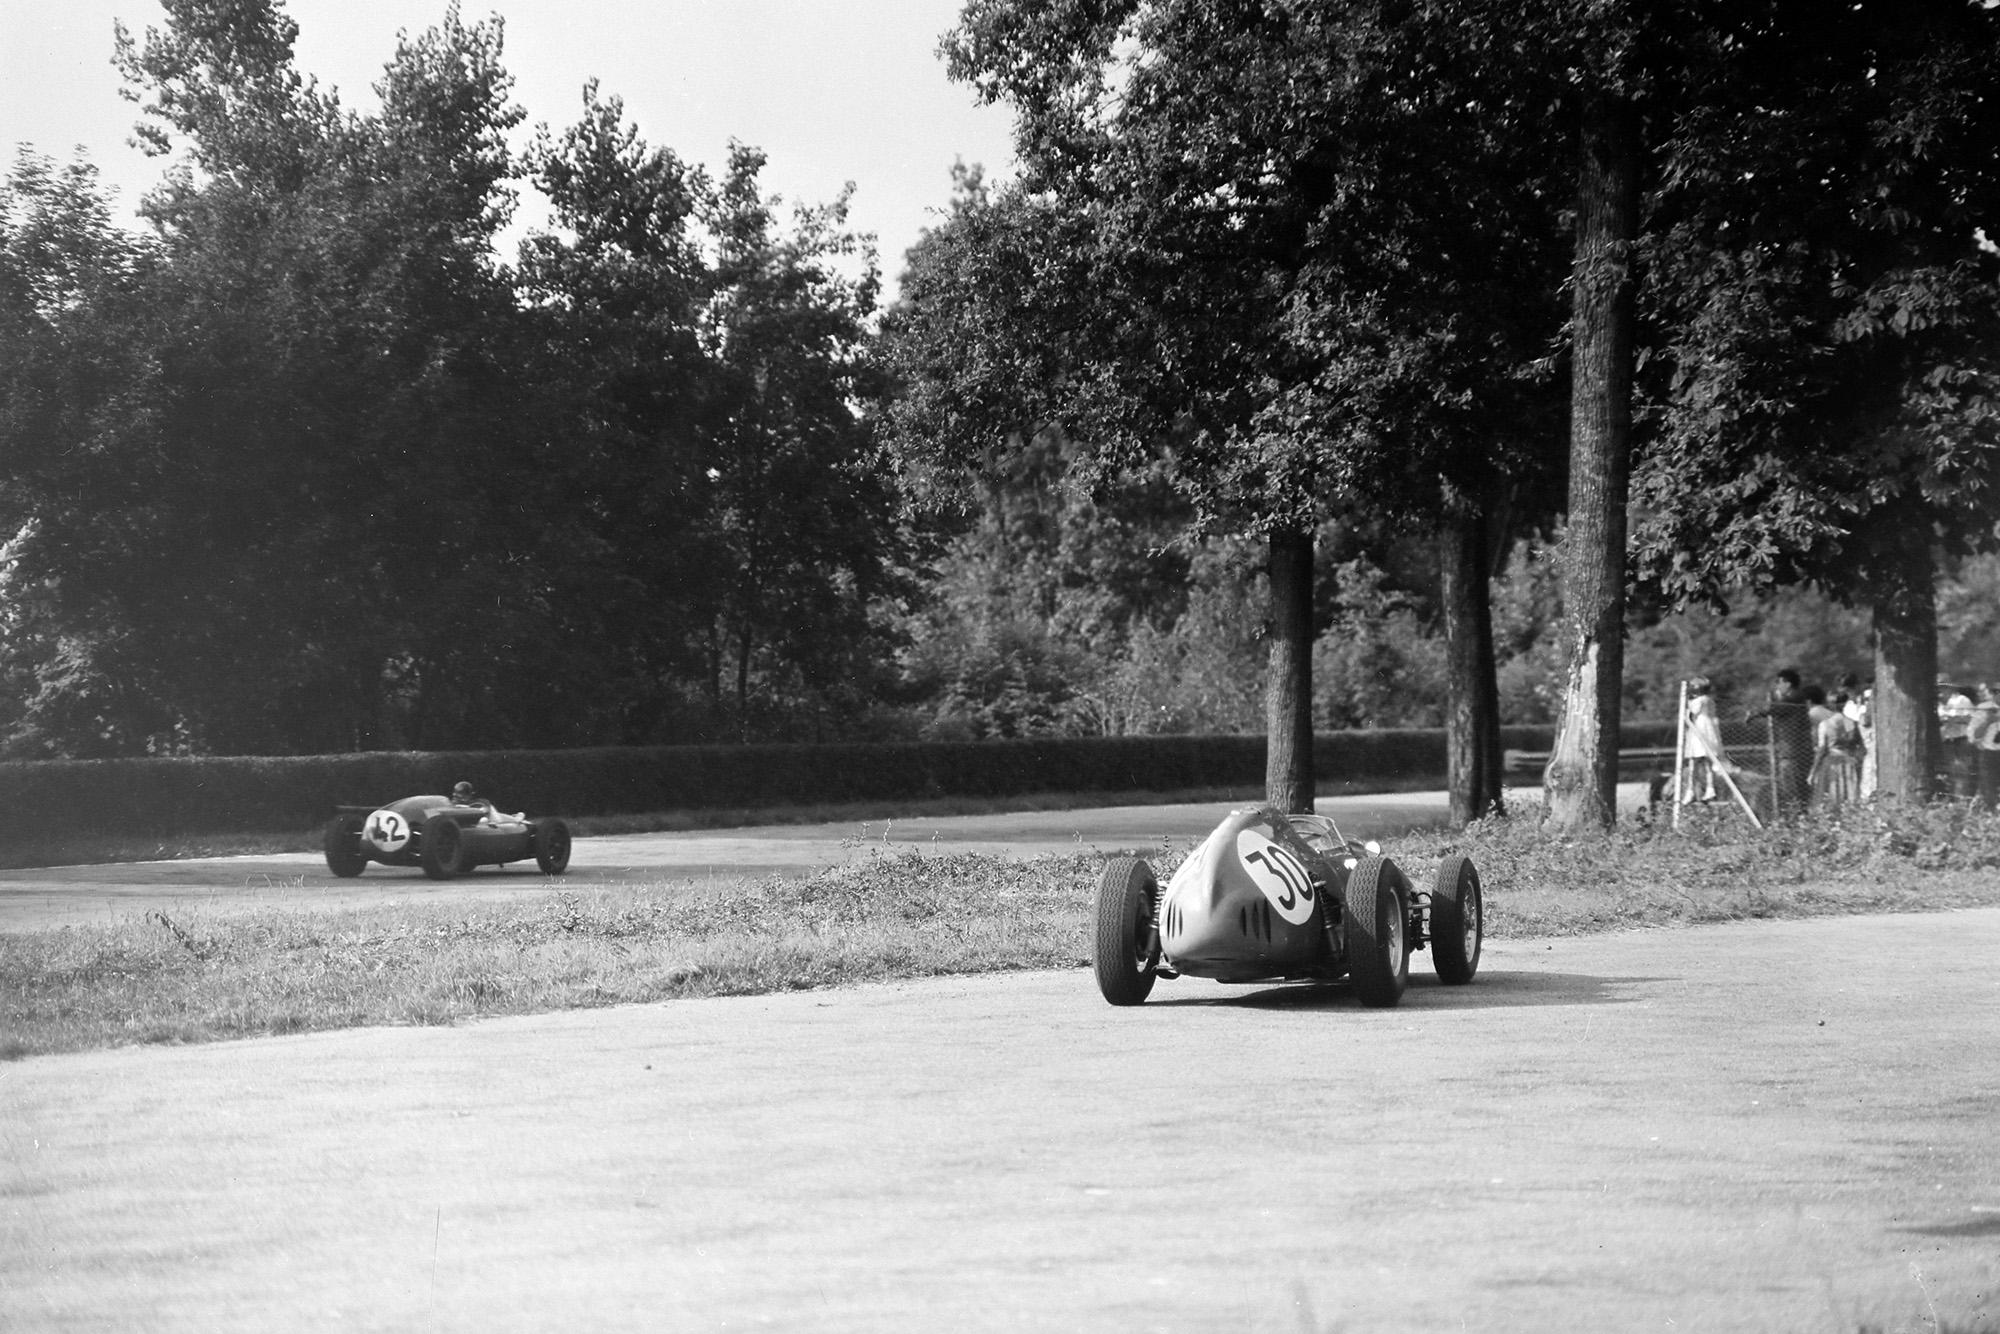 Ian Burgess passes Tony Brooks' retired Ferrari in the 1959 Italian Grand Prix